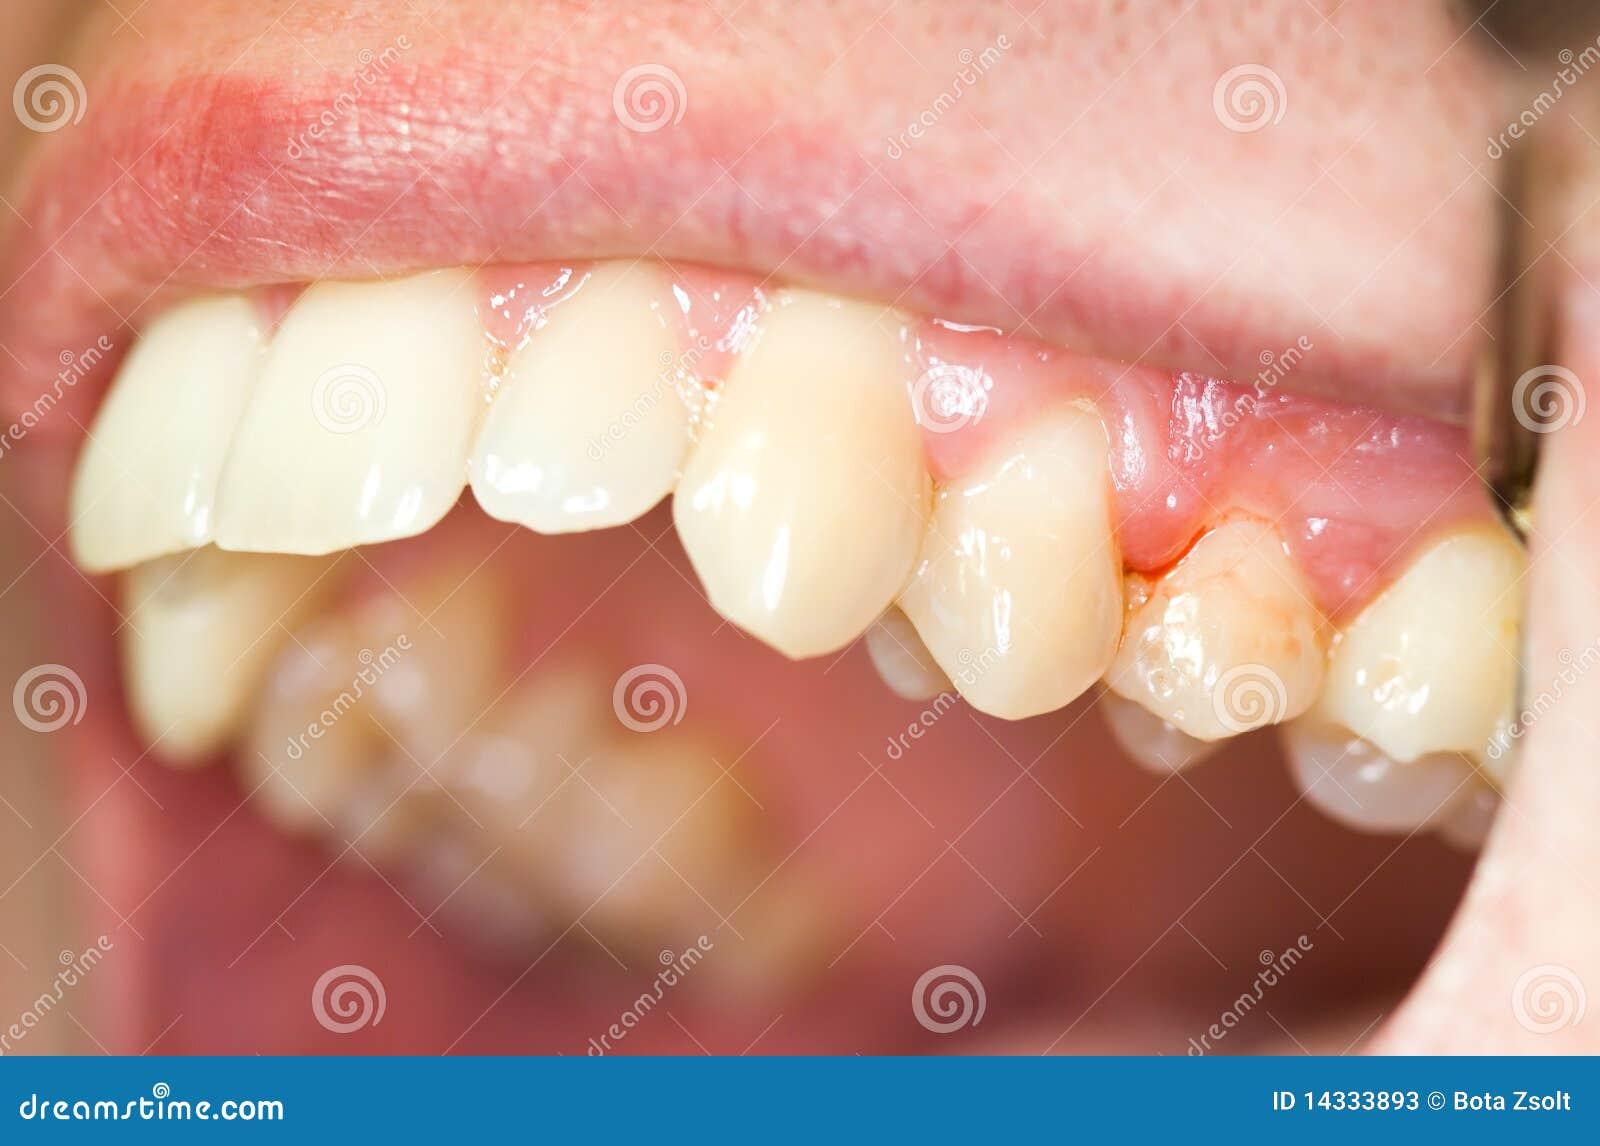 Teeth And Gingivitis Stock Photos Image 14333893